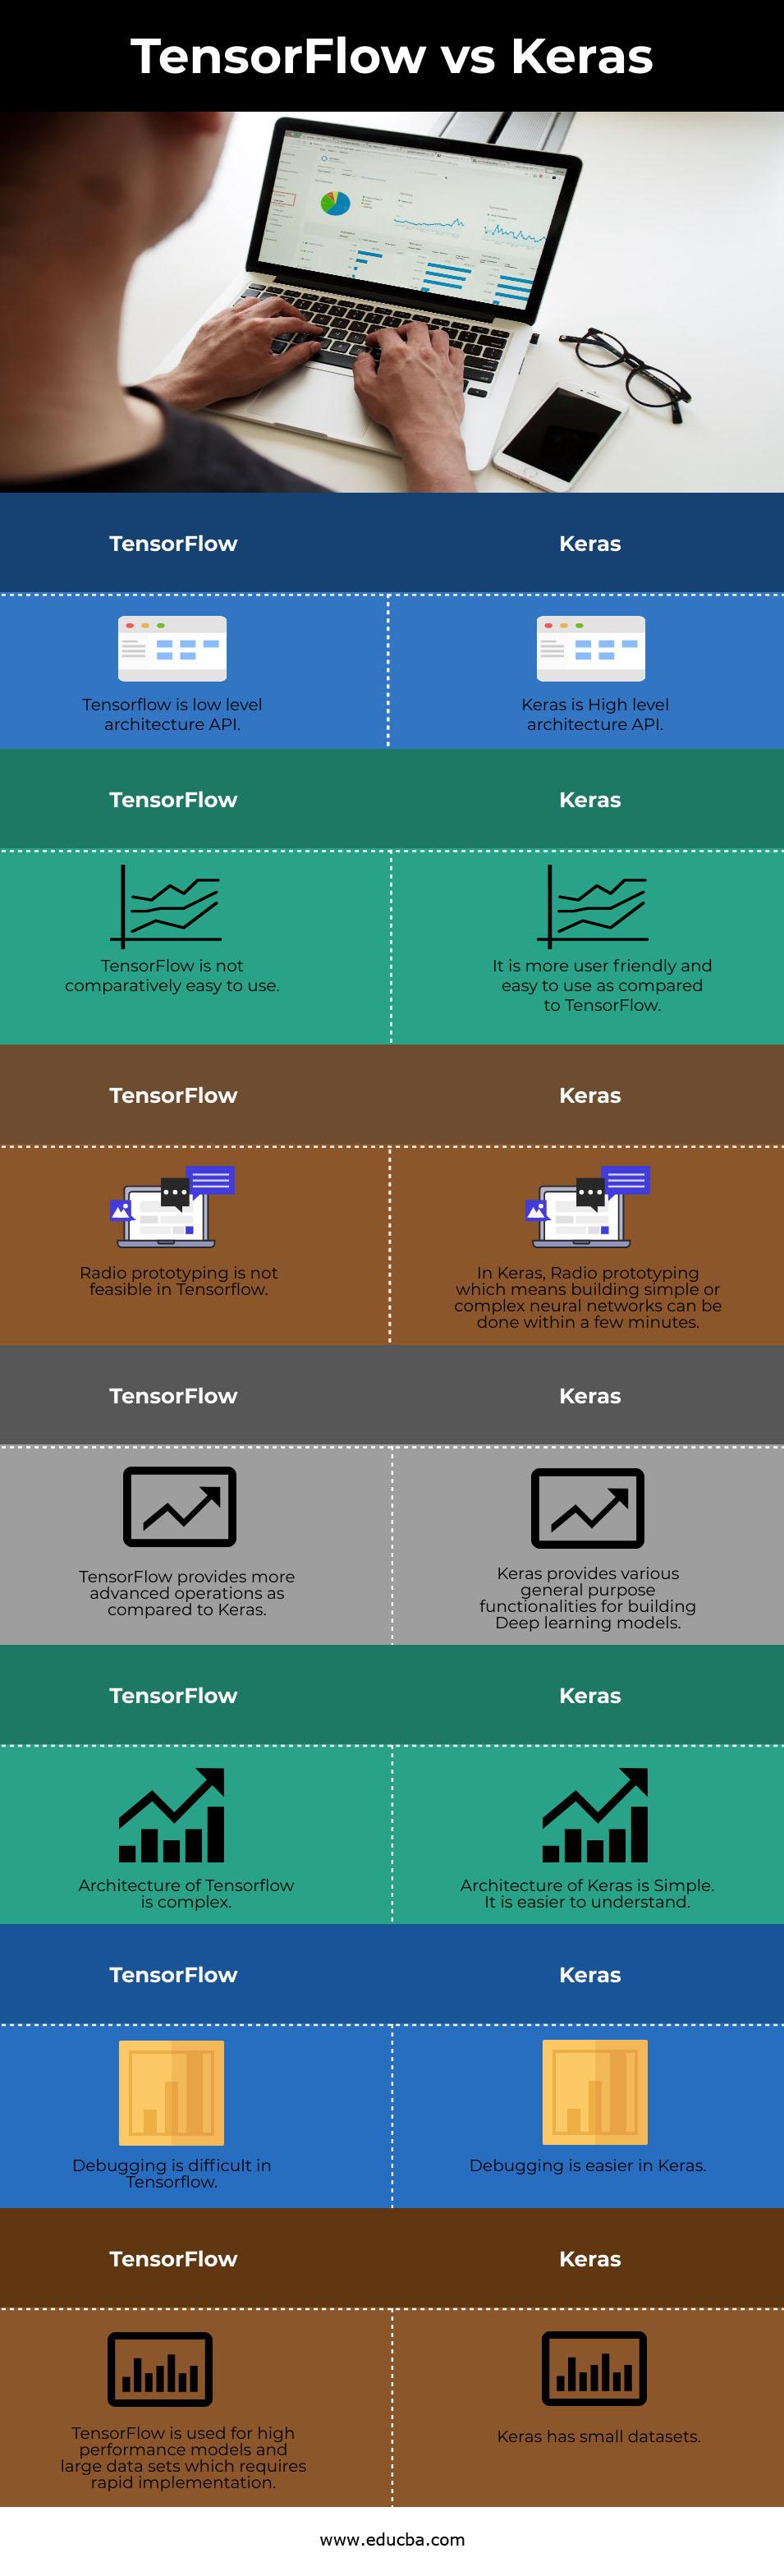 TensorFlow vs Keras info